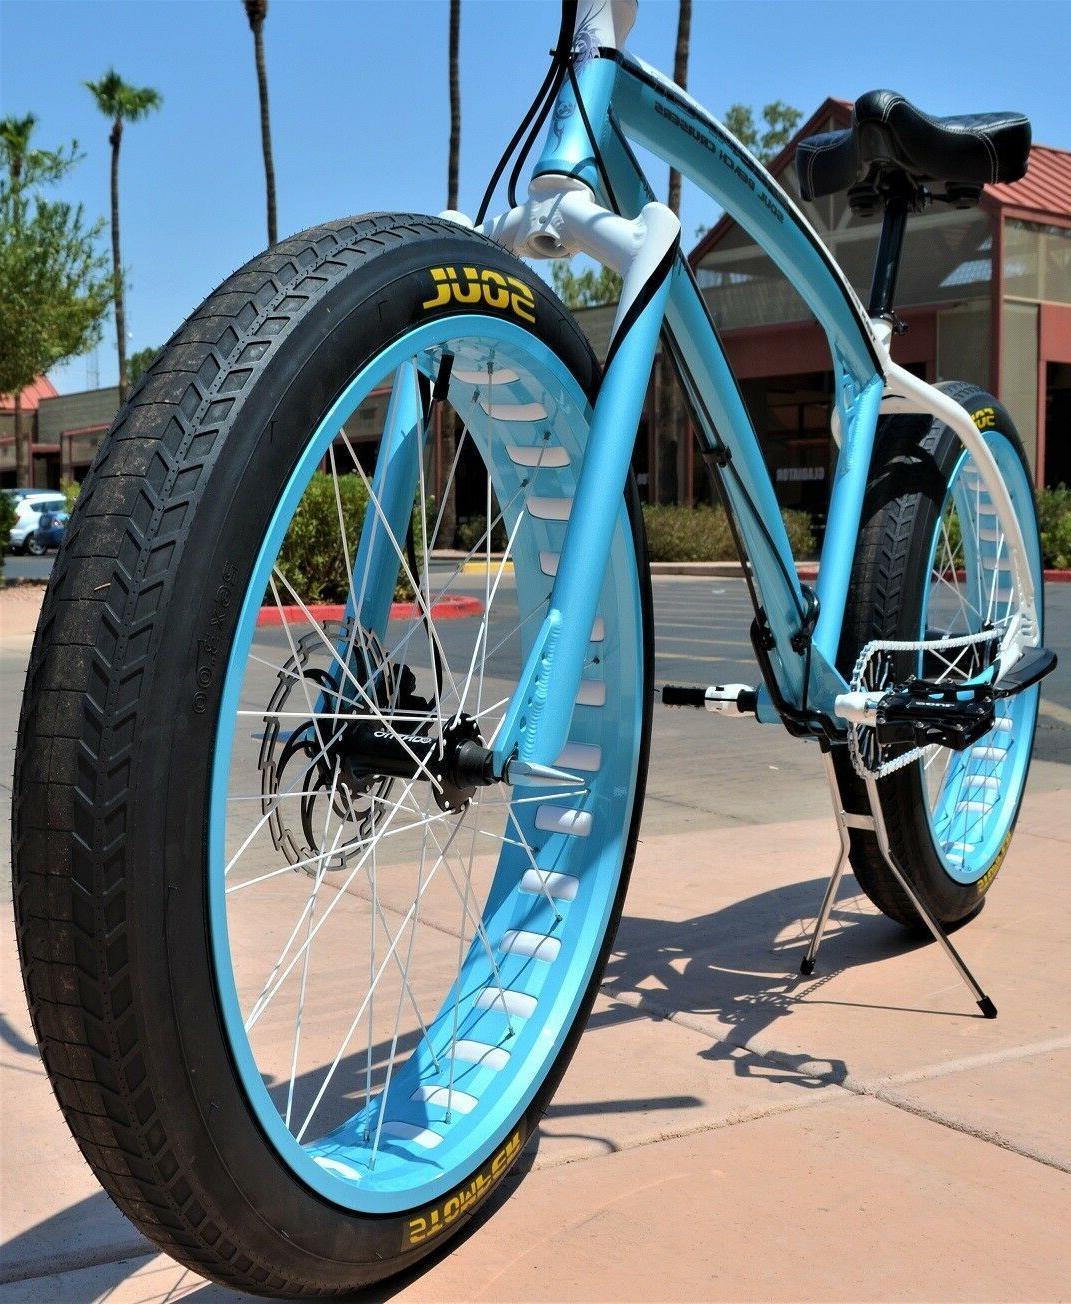 26 x3 soul fast cruiser fat bikes